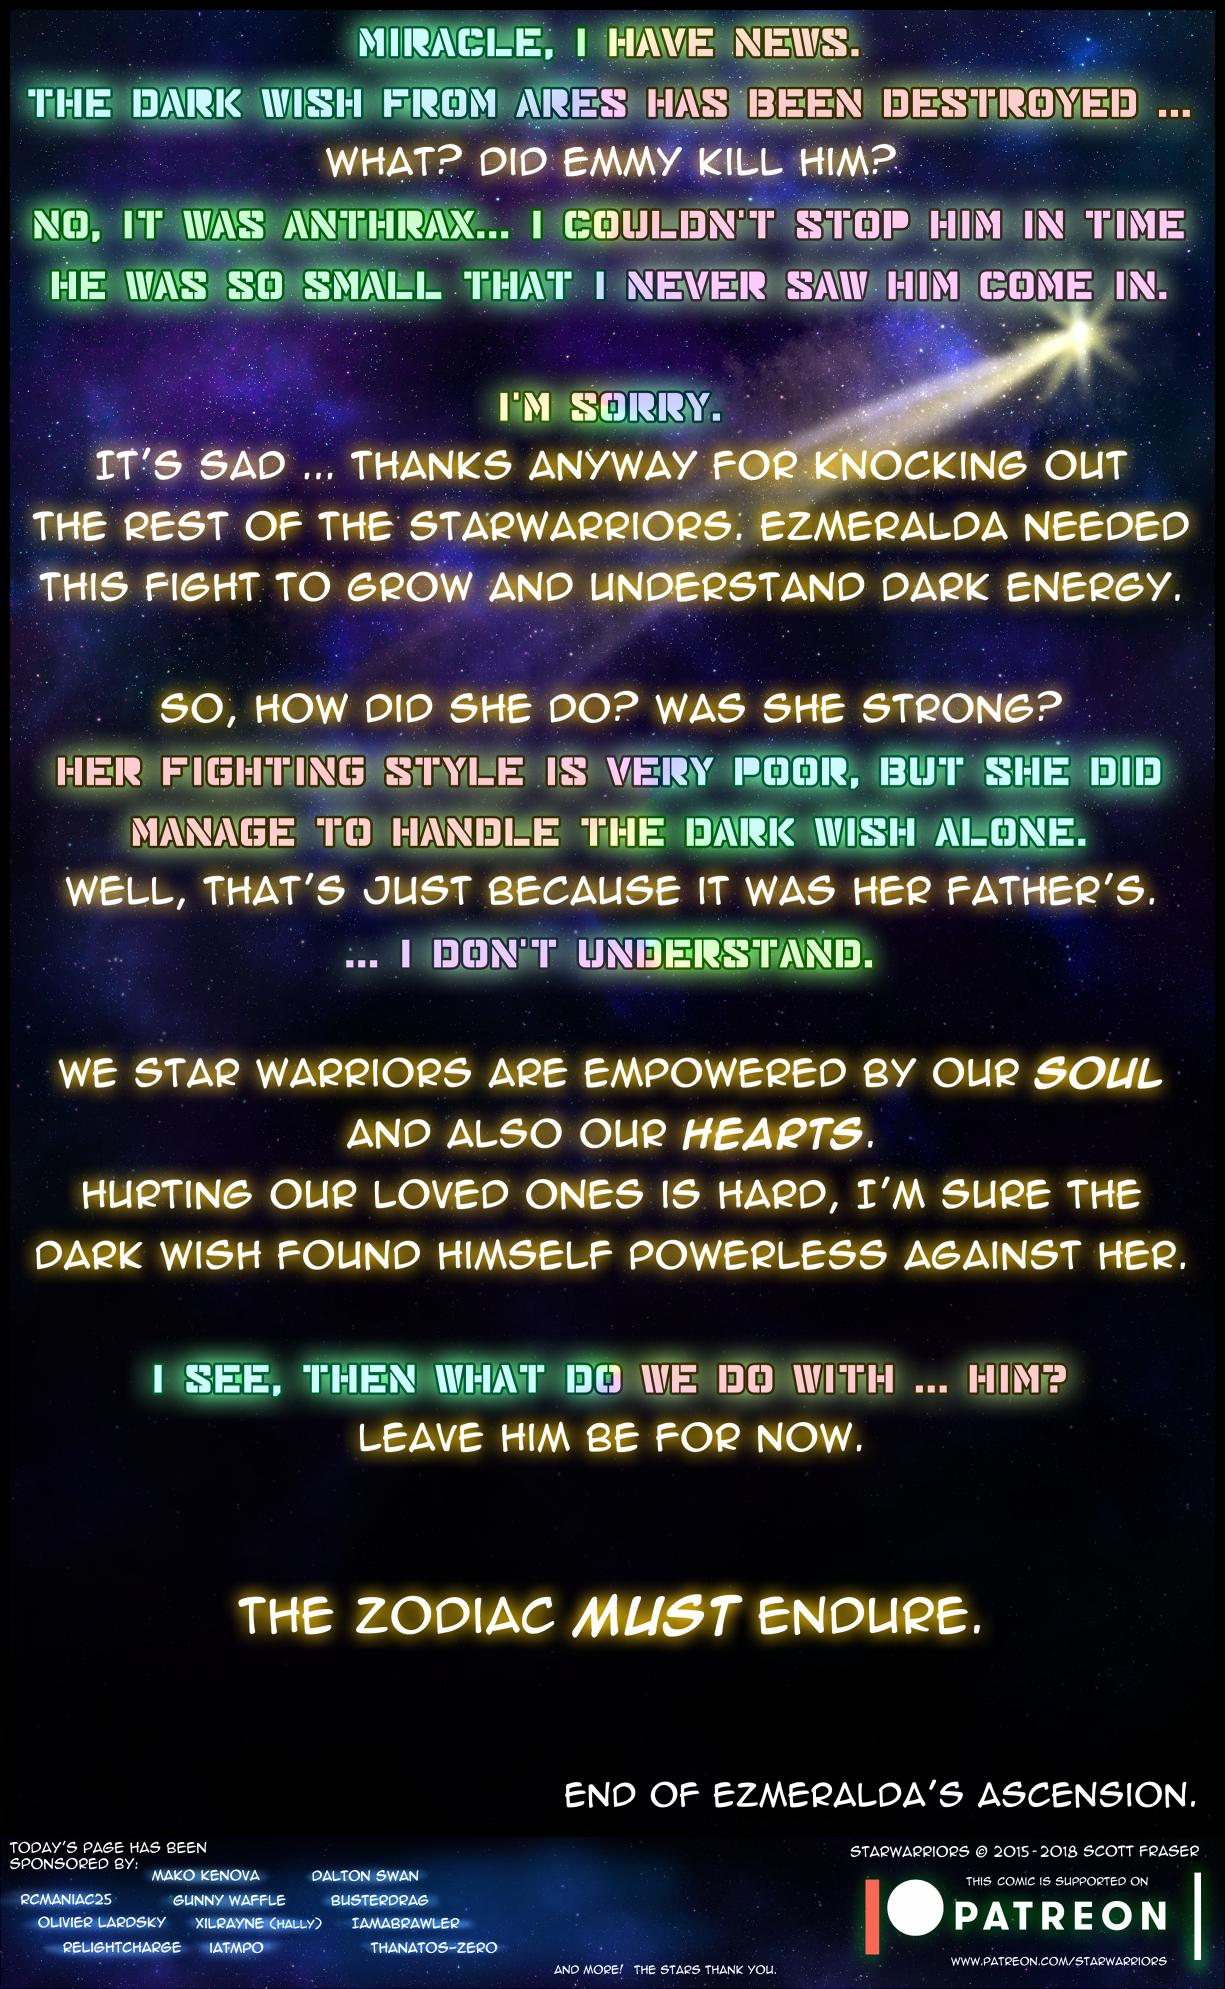 Ch3 Page 62 – Conversation